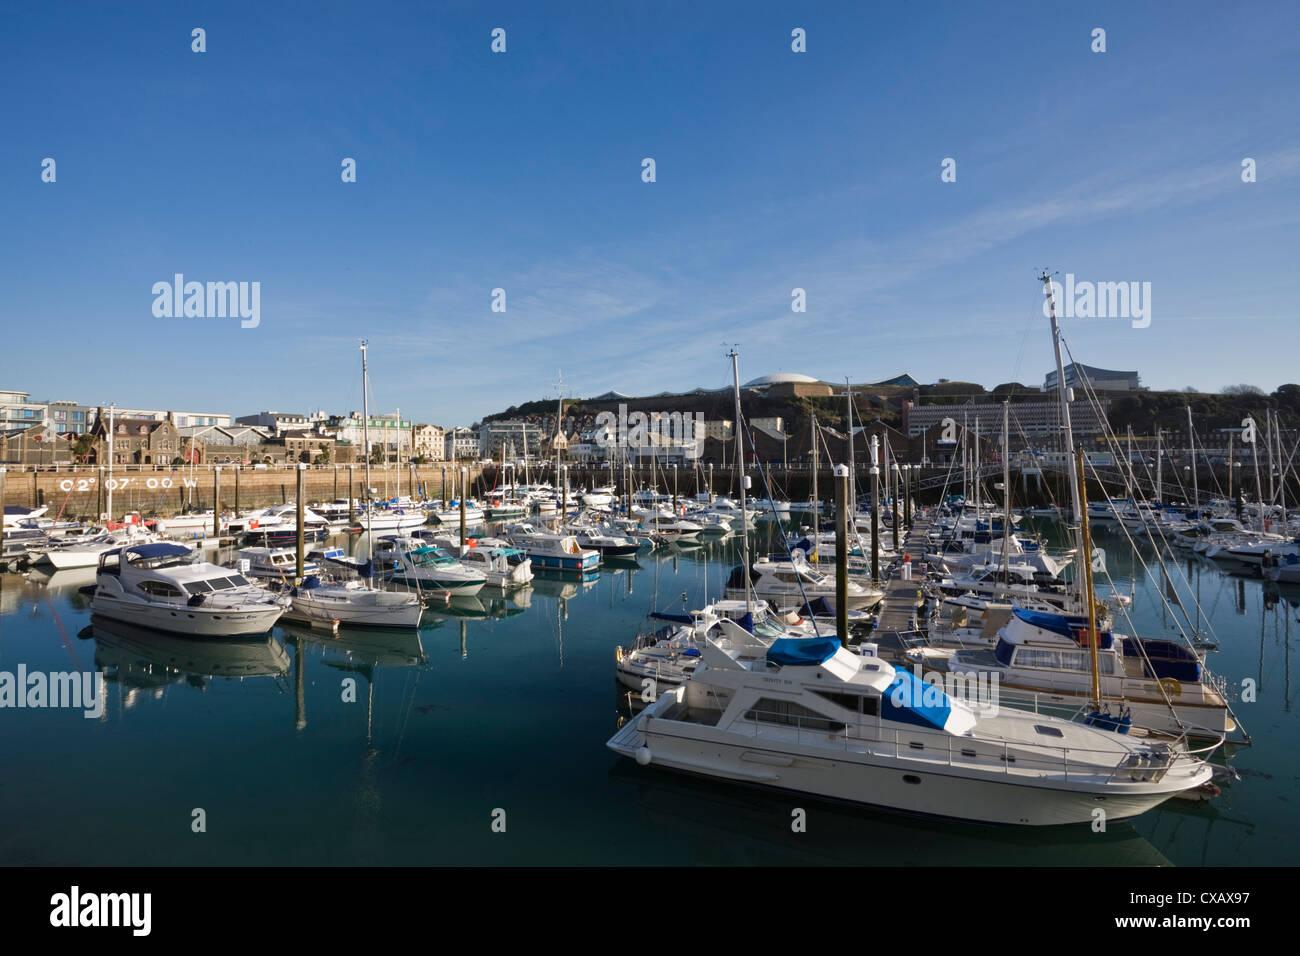 Albert Harbour, St. Helier, Jersey, Channel Islands, United Kingdom, Europe - Stock Image